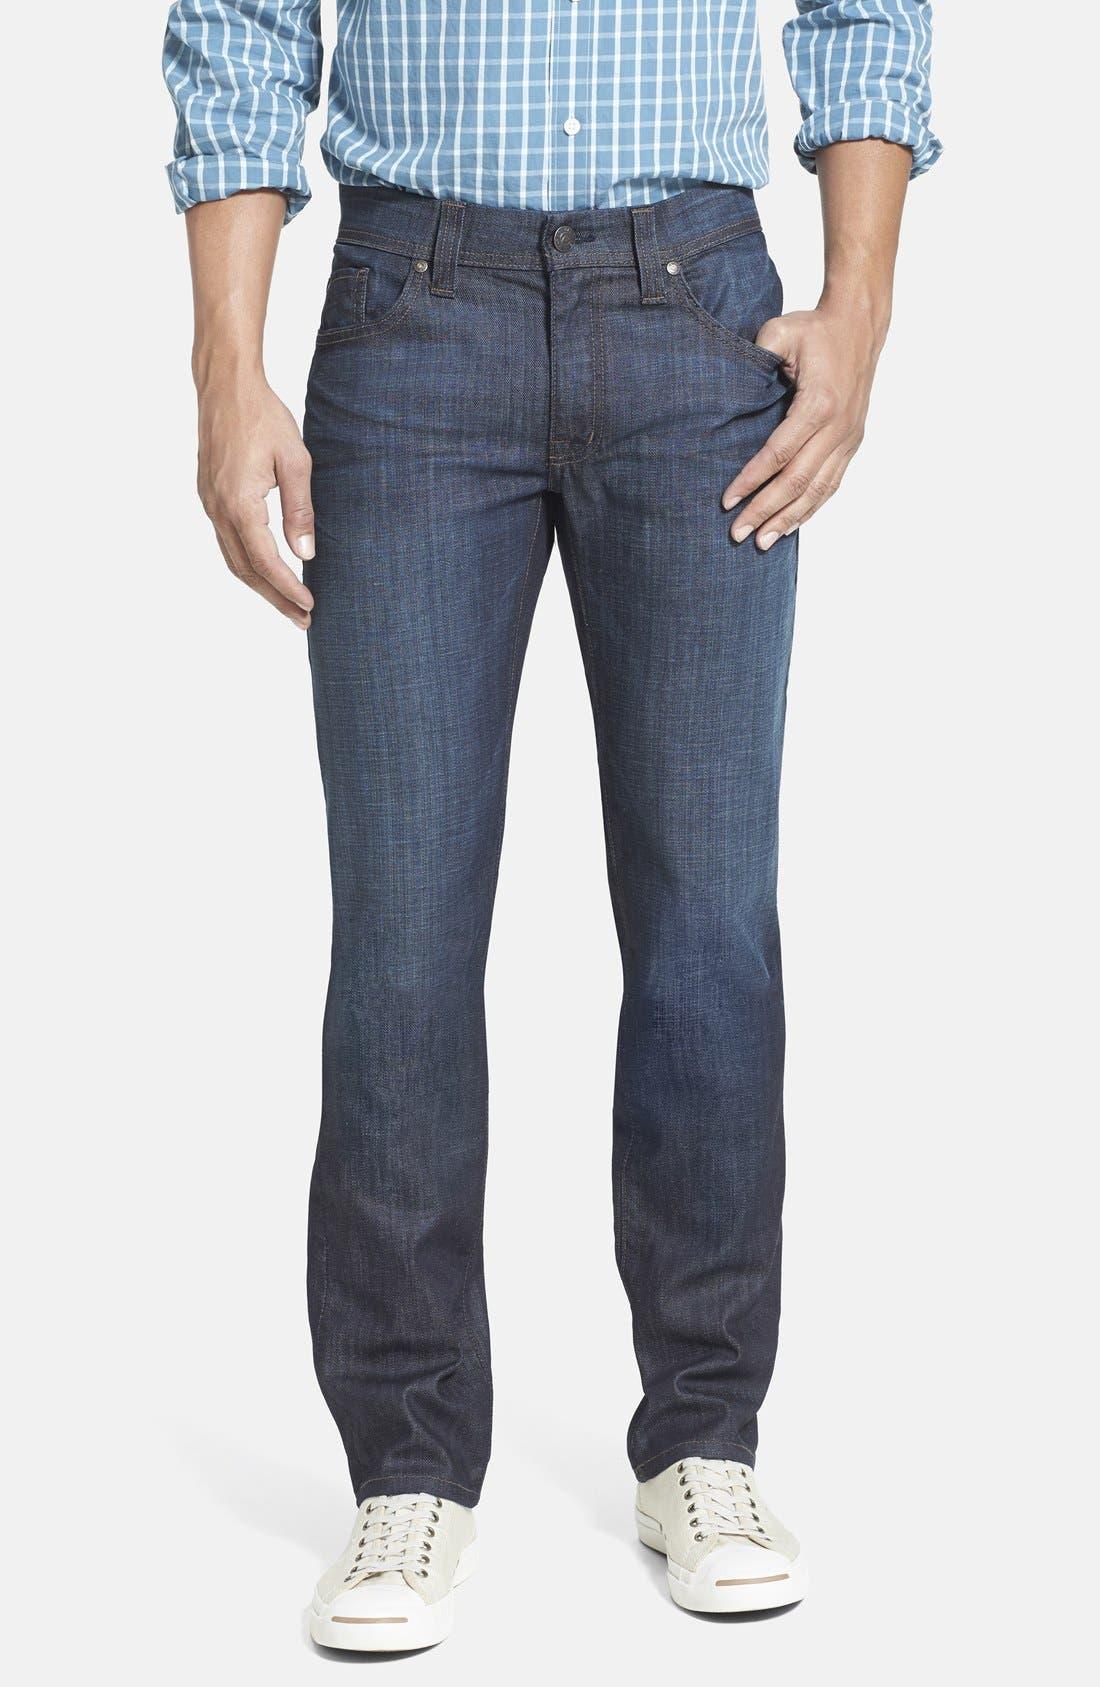 'Jimmy' Slim Straight Leg Jeans,                             Main thumbnail 1, color,                             400